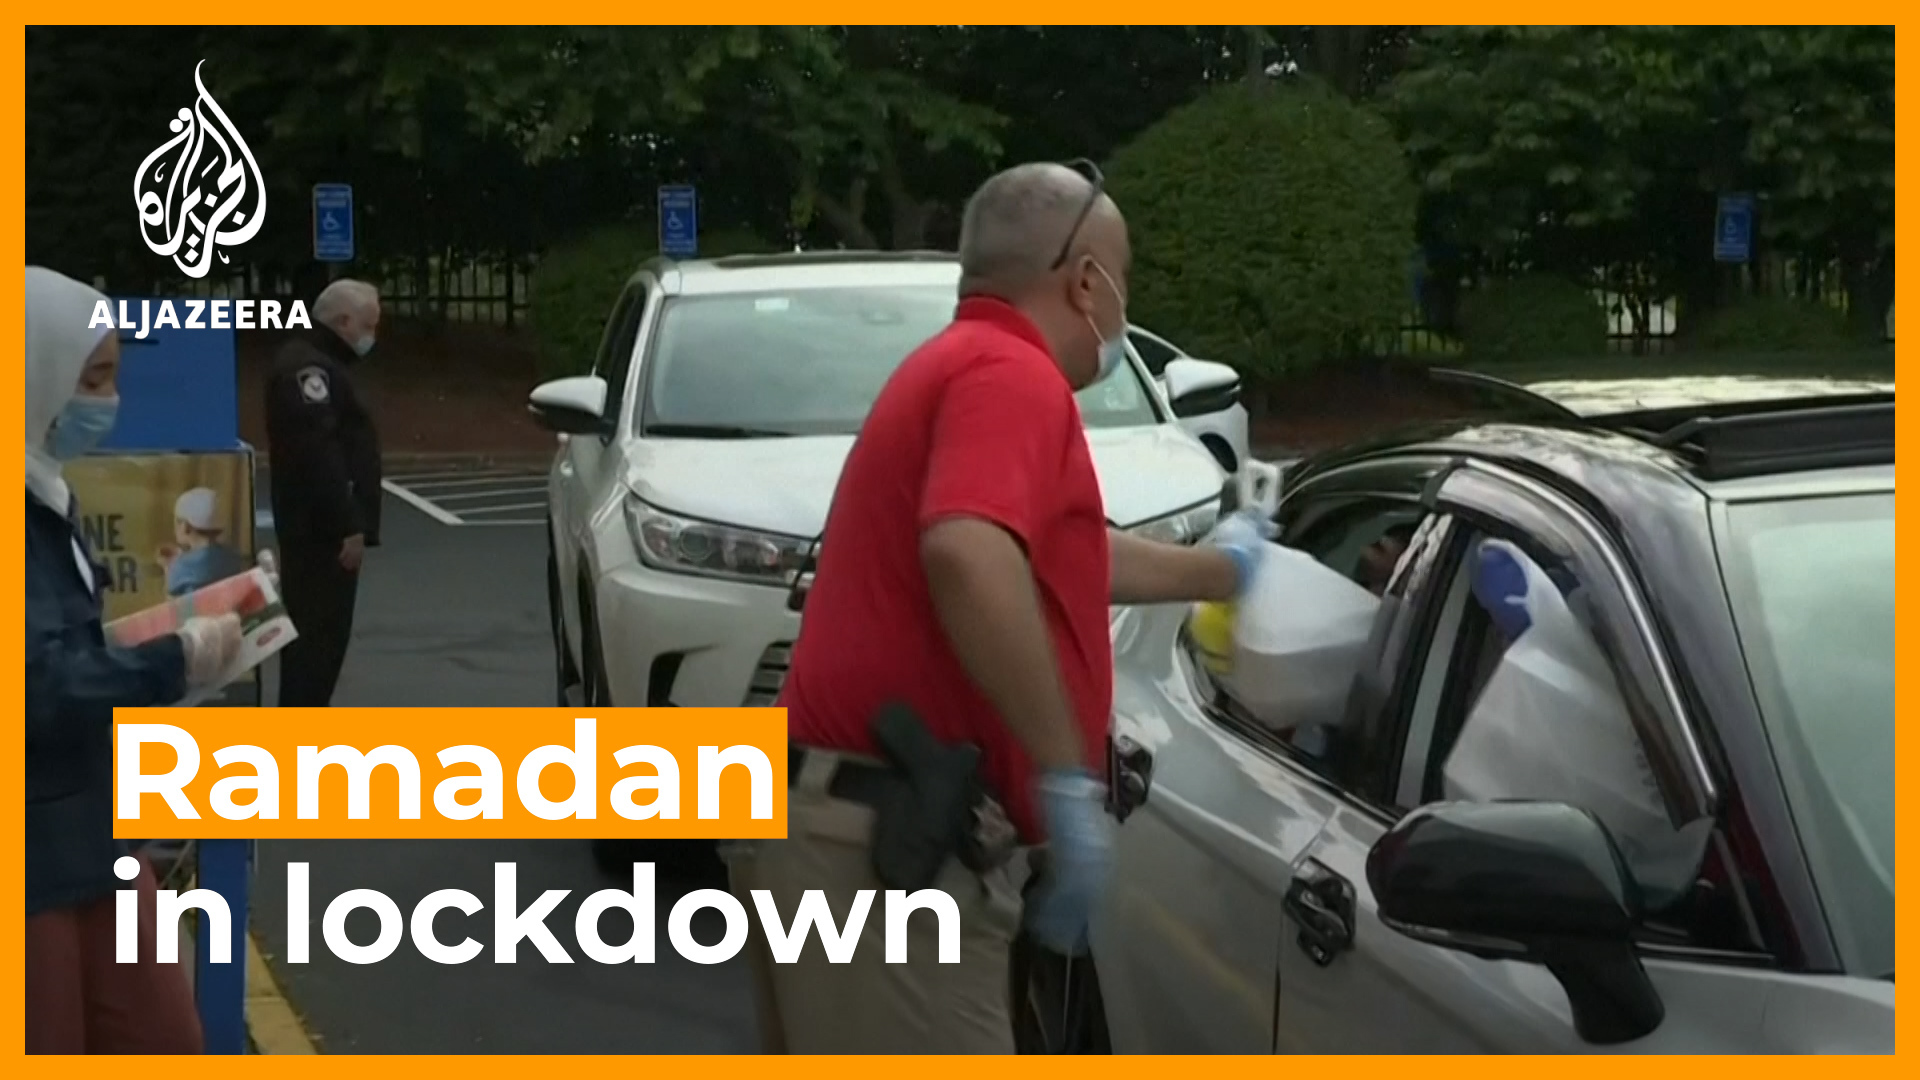 Ramadan under lockdown in Virginia